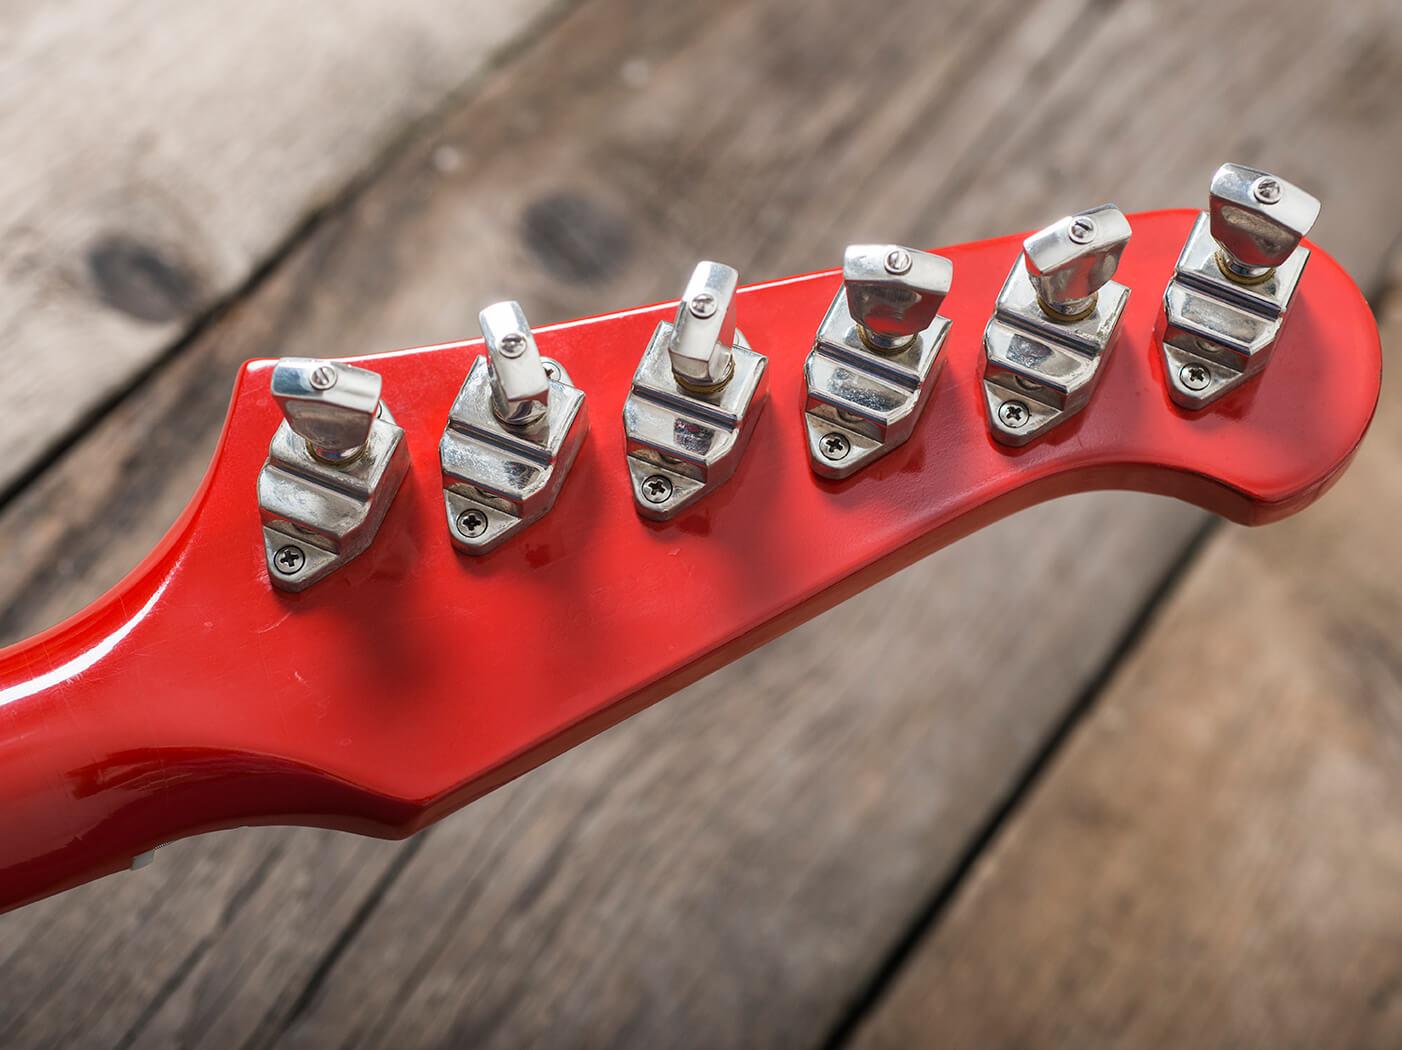 Gibson 1964 Firebird III red machine heads